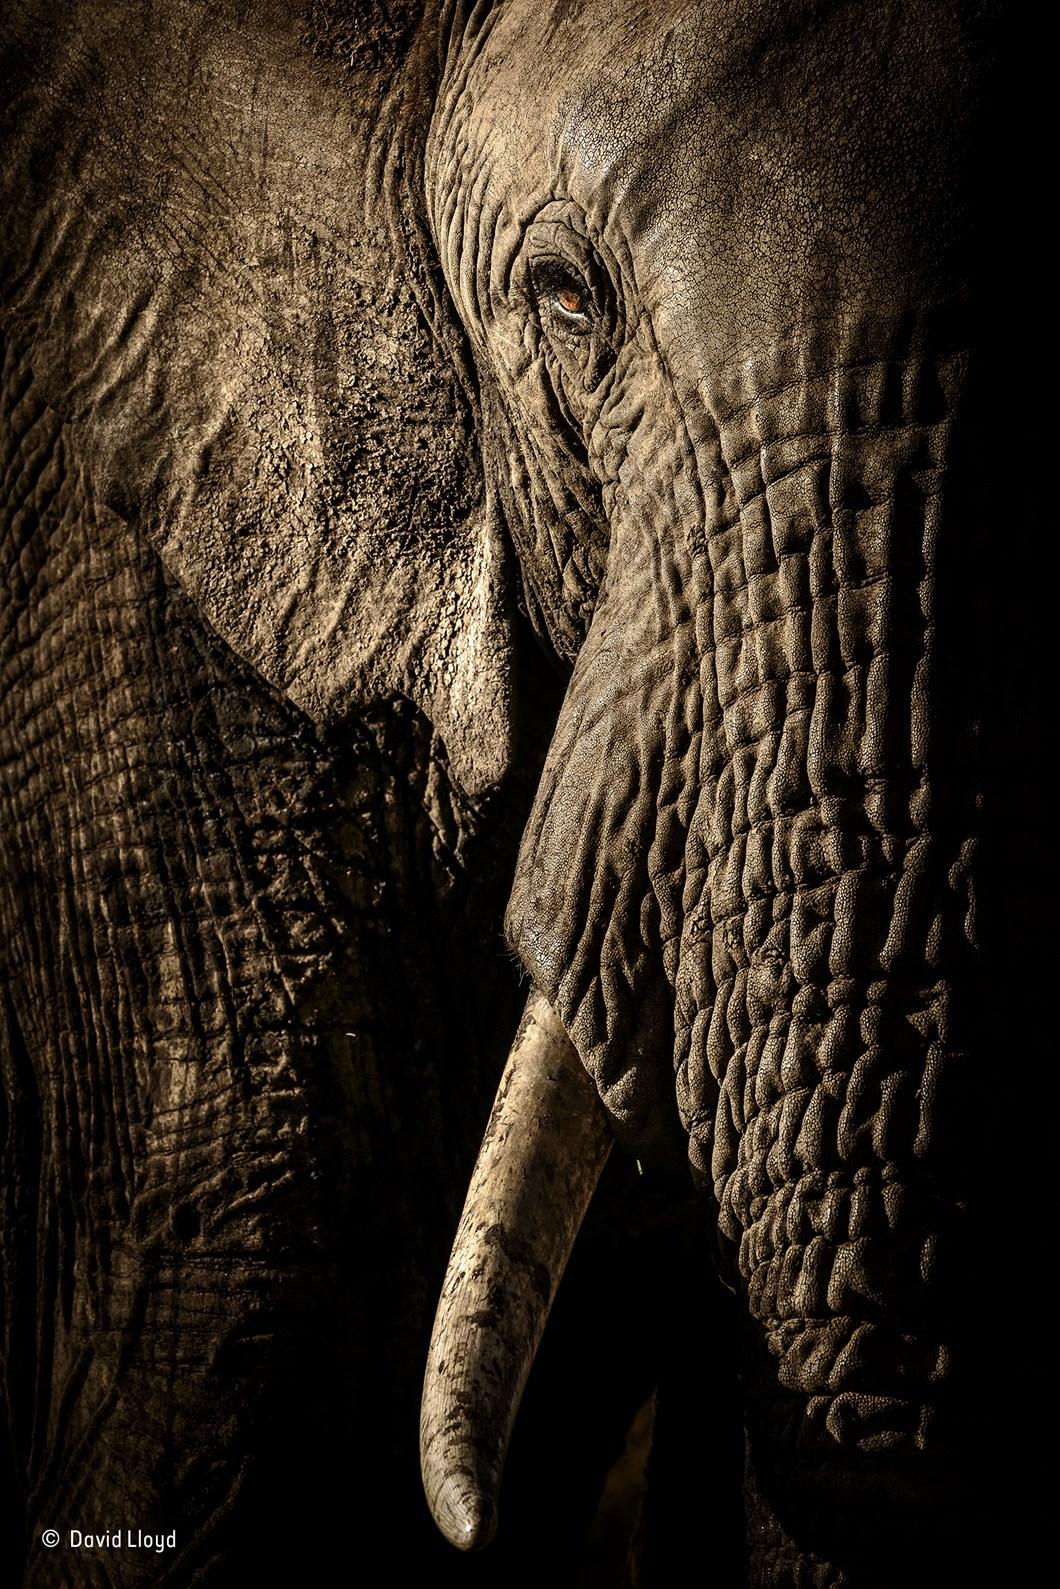 The power of the matriarch_David Lloyd_Wildlife Photographer of the Year_2017_09_11.jpg